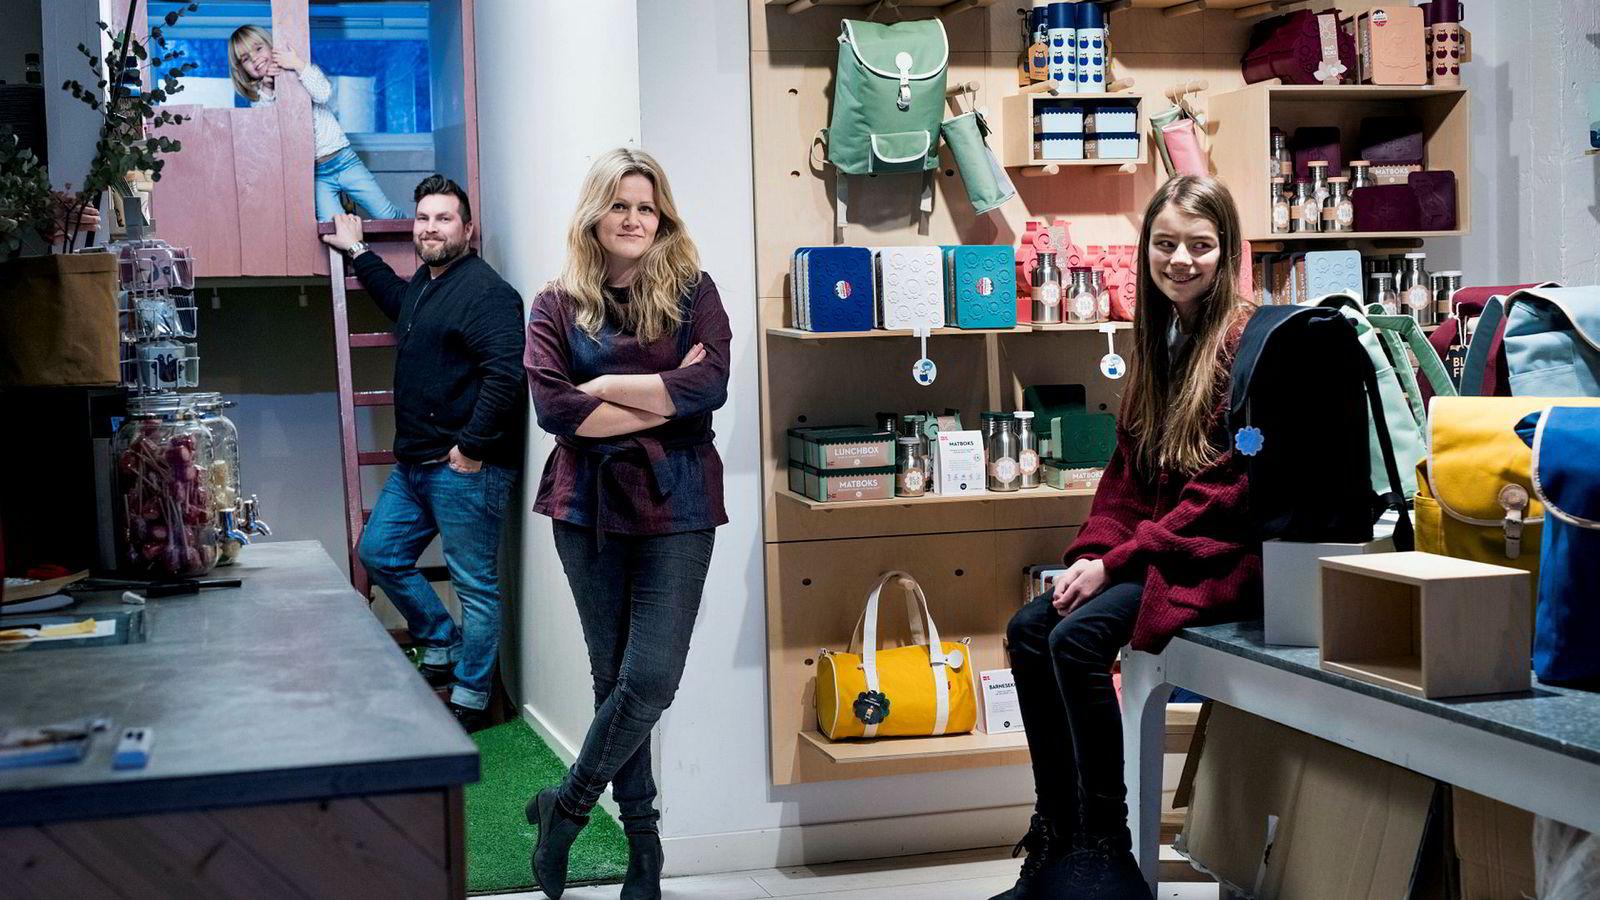 Blafre-familien har showroom på Ekeberg i Oslo. Fra venstre junior produktrådgiver Lotta Johanna (5), produktsjef Remi David Fagervik (45), gründer Ingrid Erøy Fagervik (40) og senior produktrådgiver Nora Mathea (12). Alle foto: Skjalg Bøhmer Vold